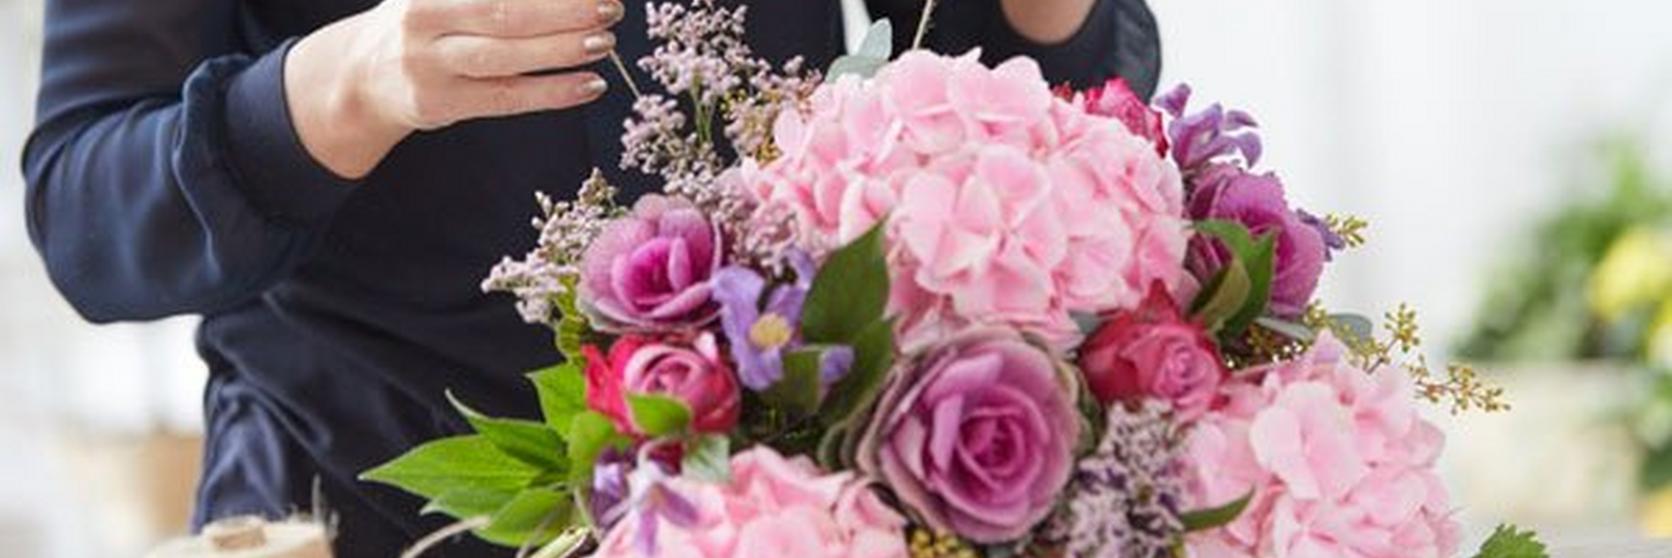 florist-working